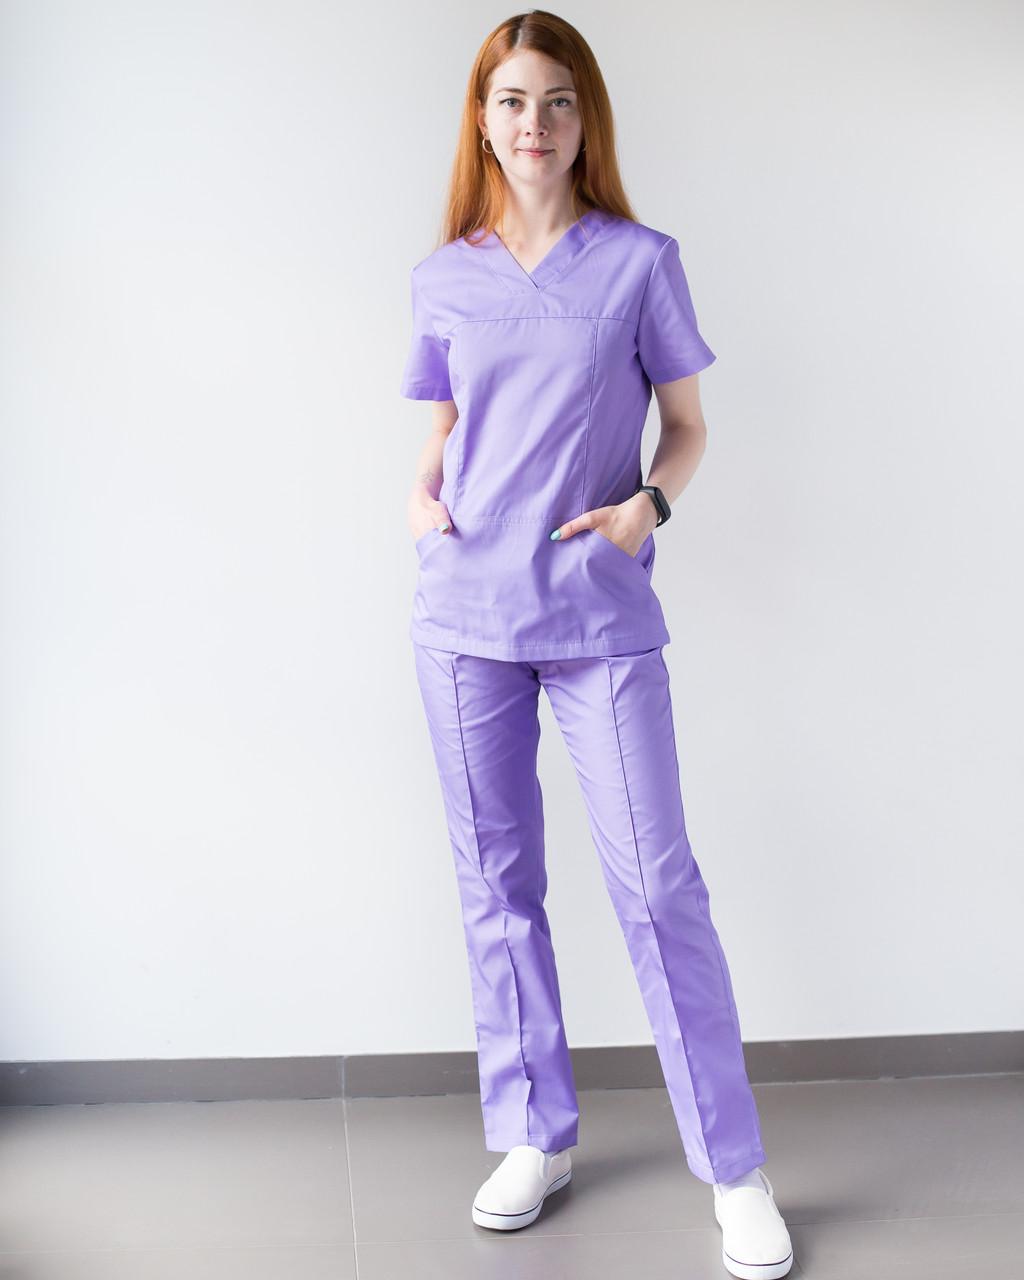 Медицинский женский костюм Топаз лаванда